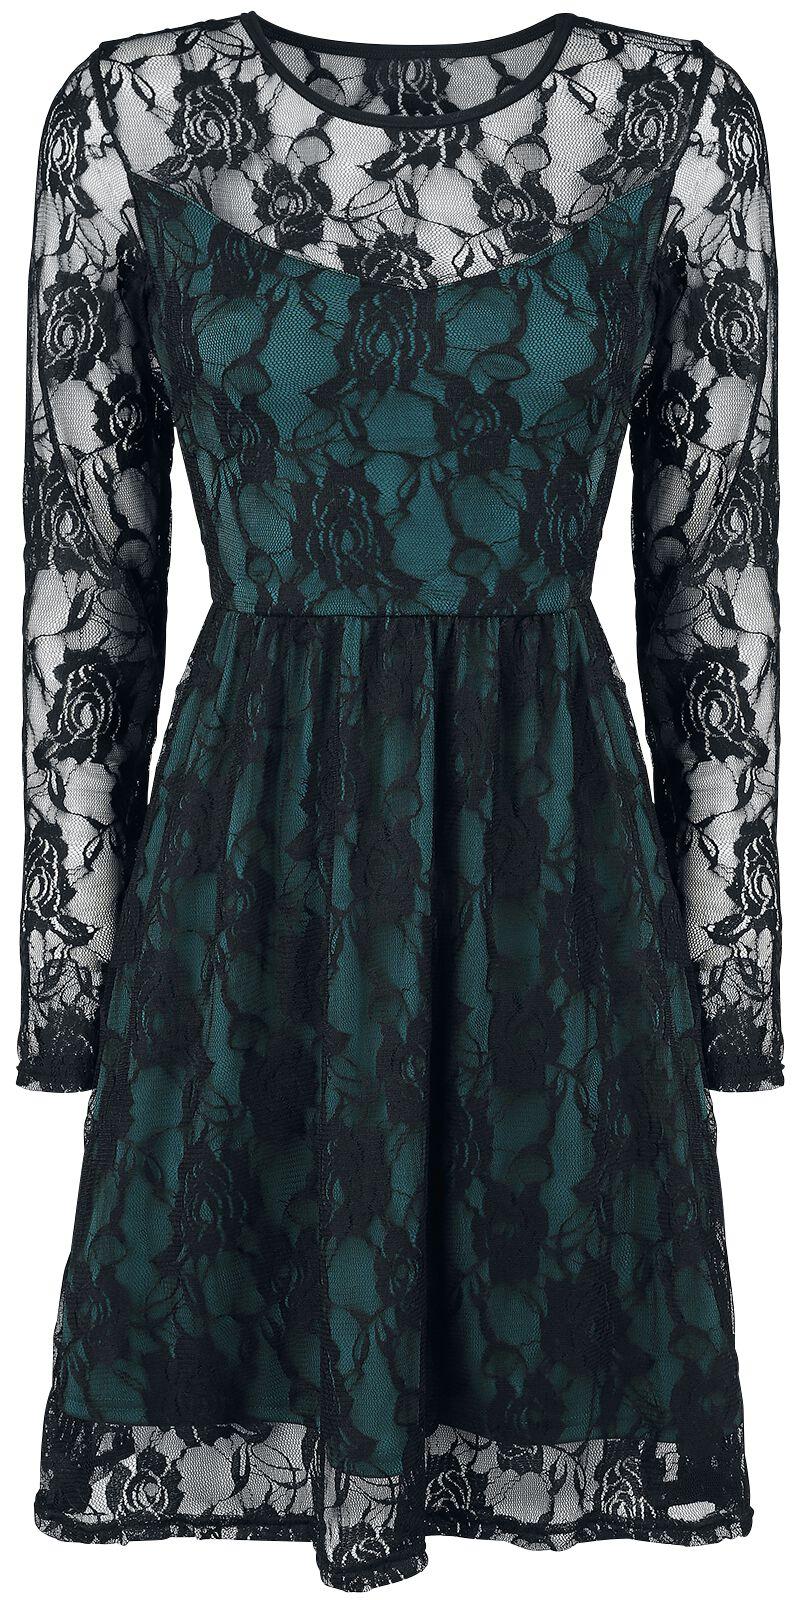 Image of   Forplay Lace Dress Kjole petrol-sort